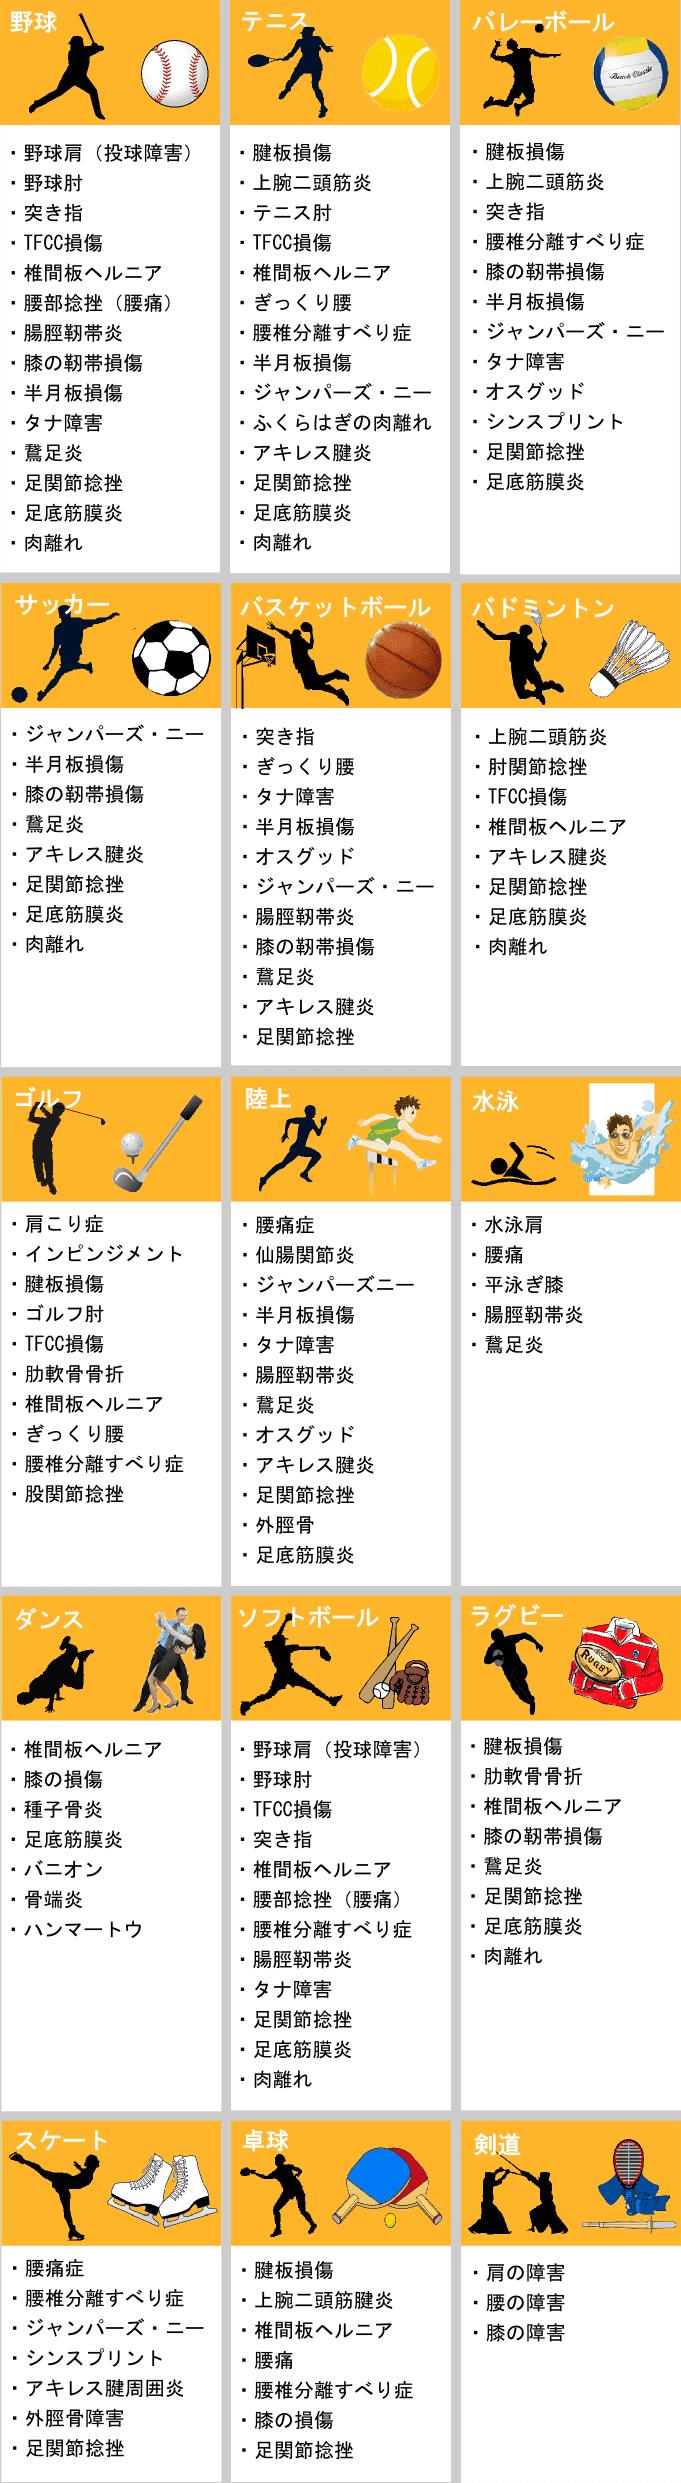 sport syougai